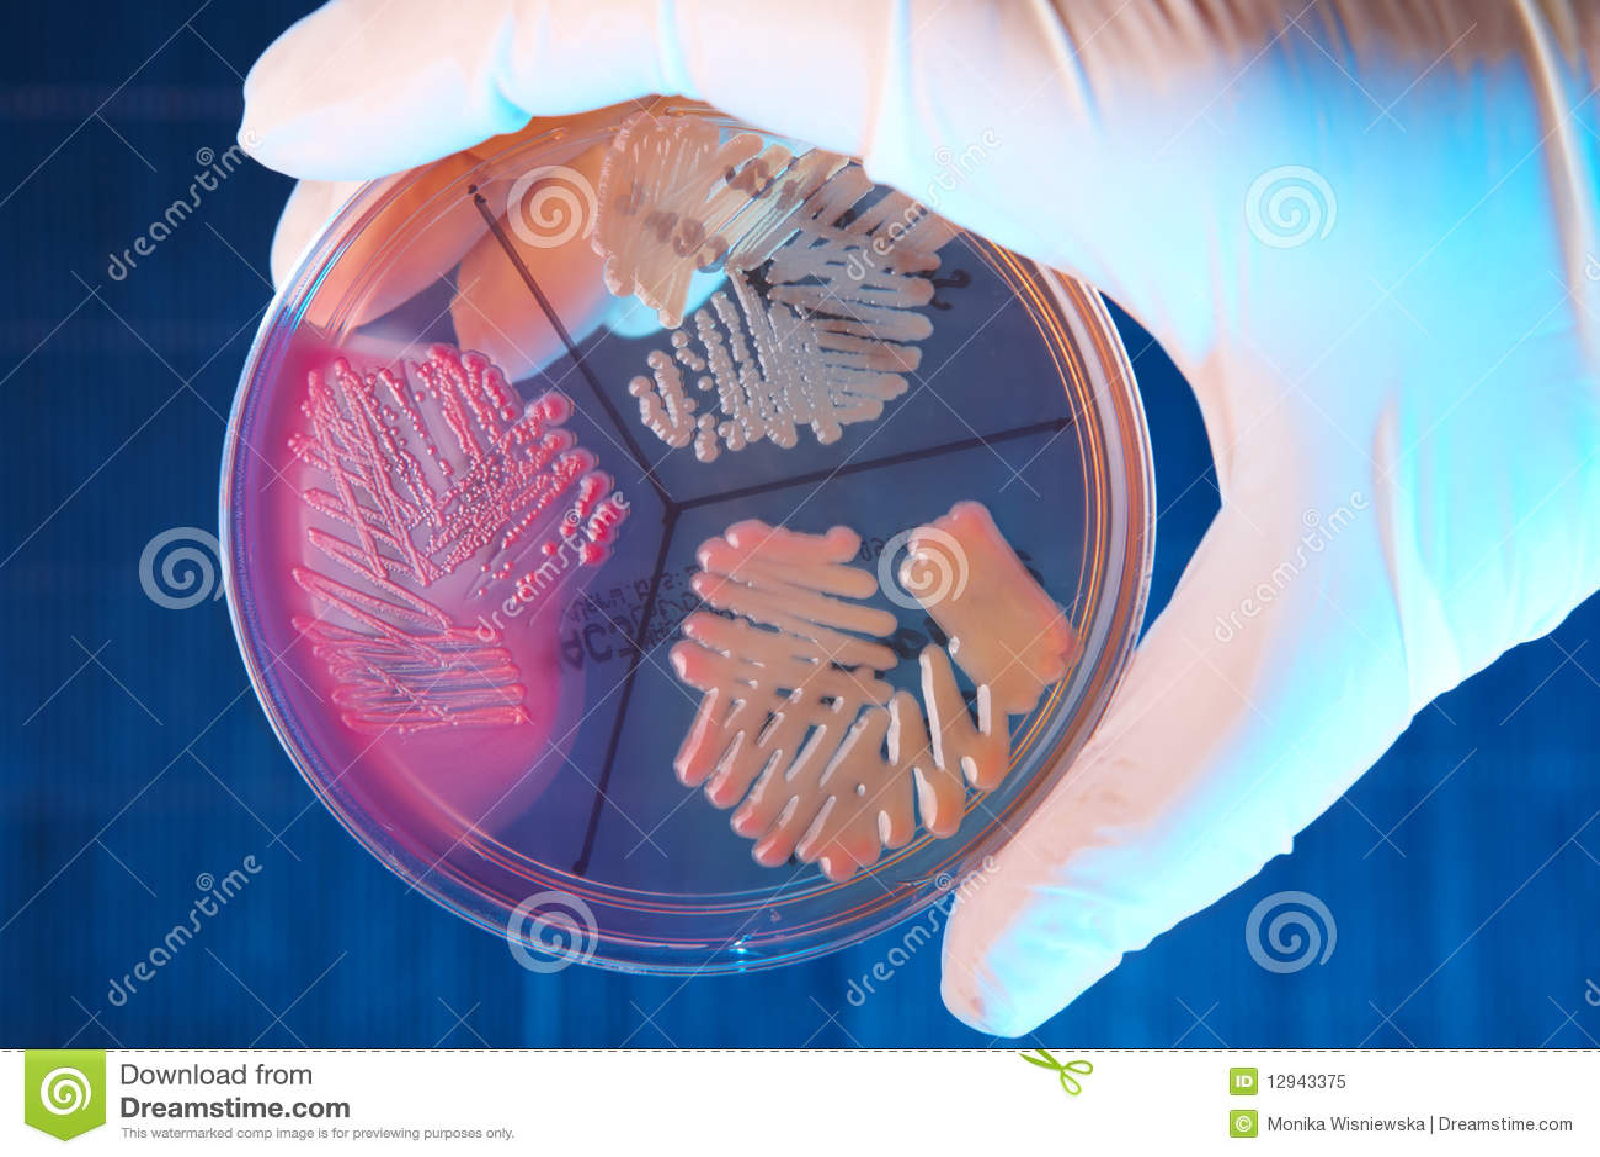 Pathological bacteria